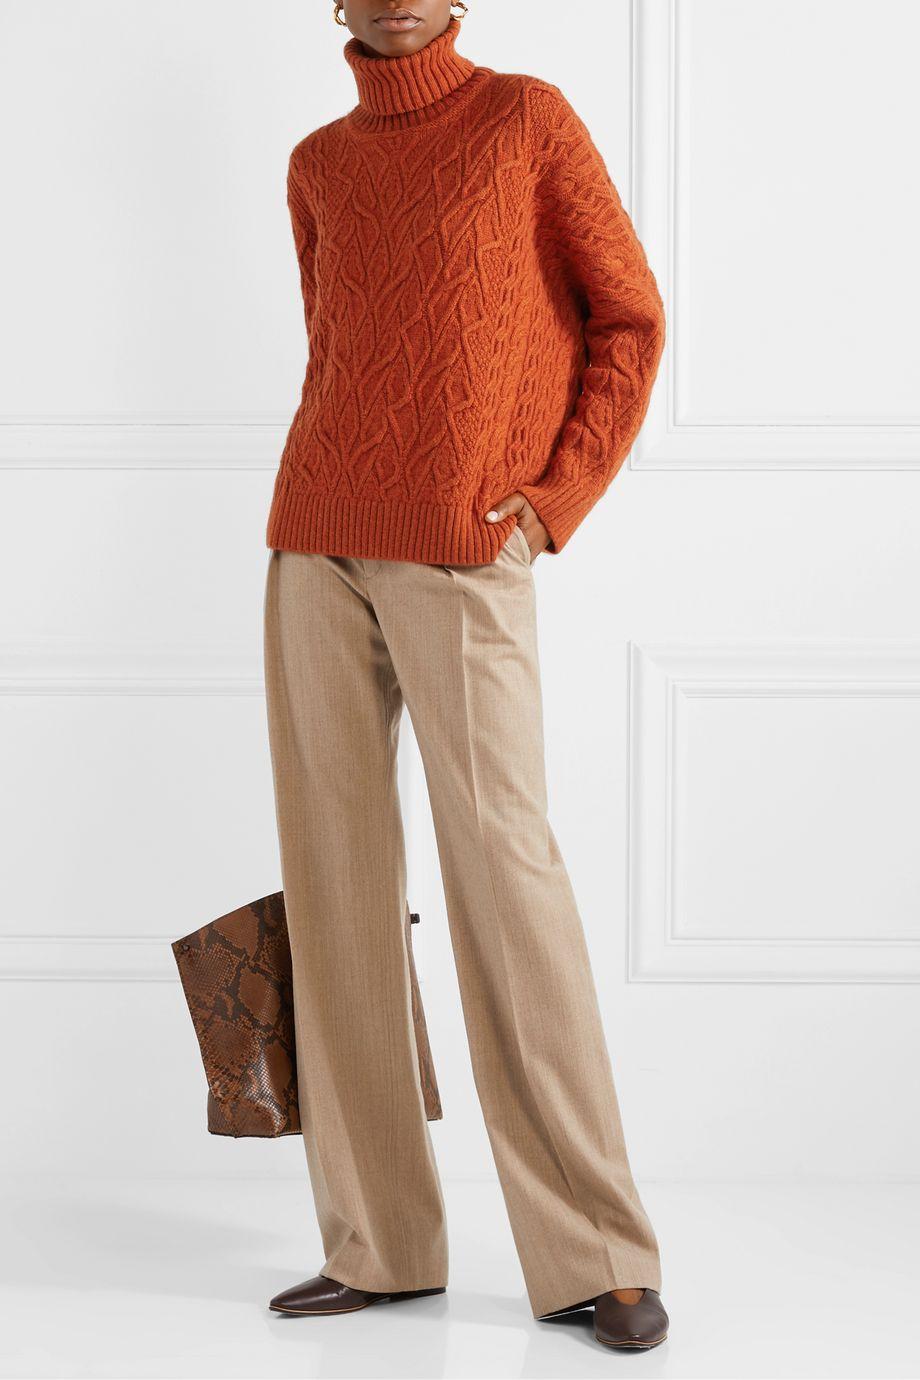 Loro Piana 绞花针织羊绒高领毛衣